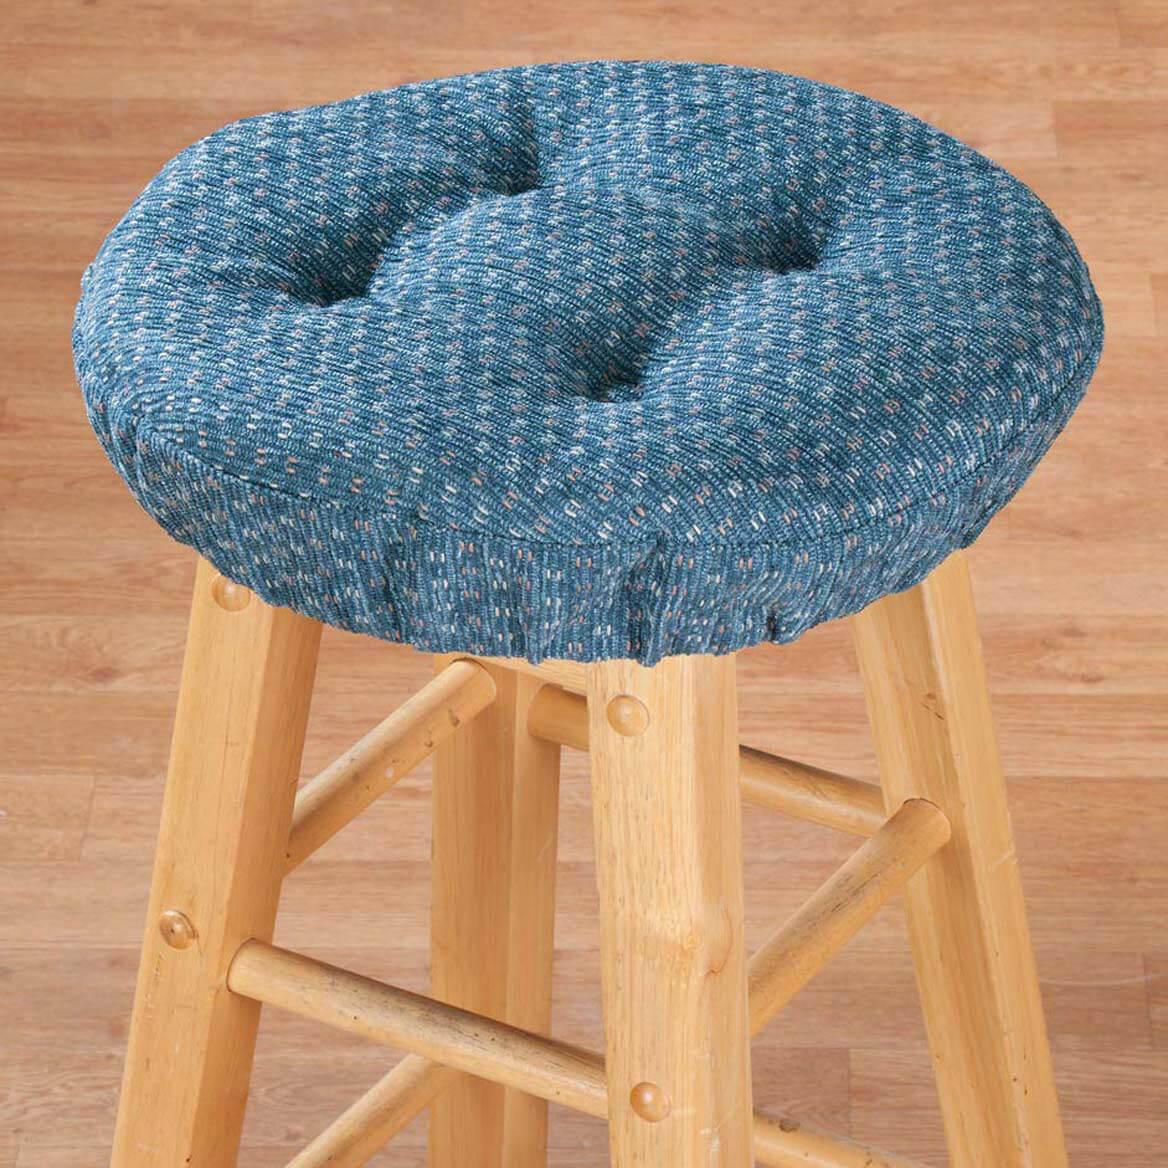 Raindrop Bar Stool Cushions - Bar Stool Cushion Covers Round ...